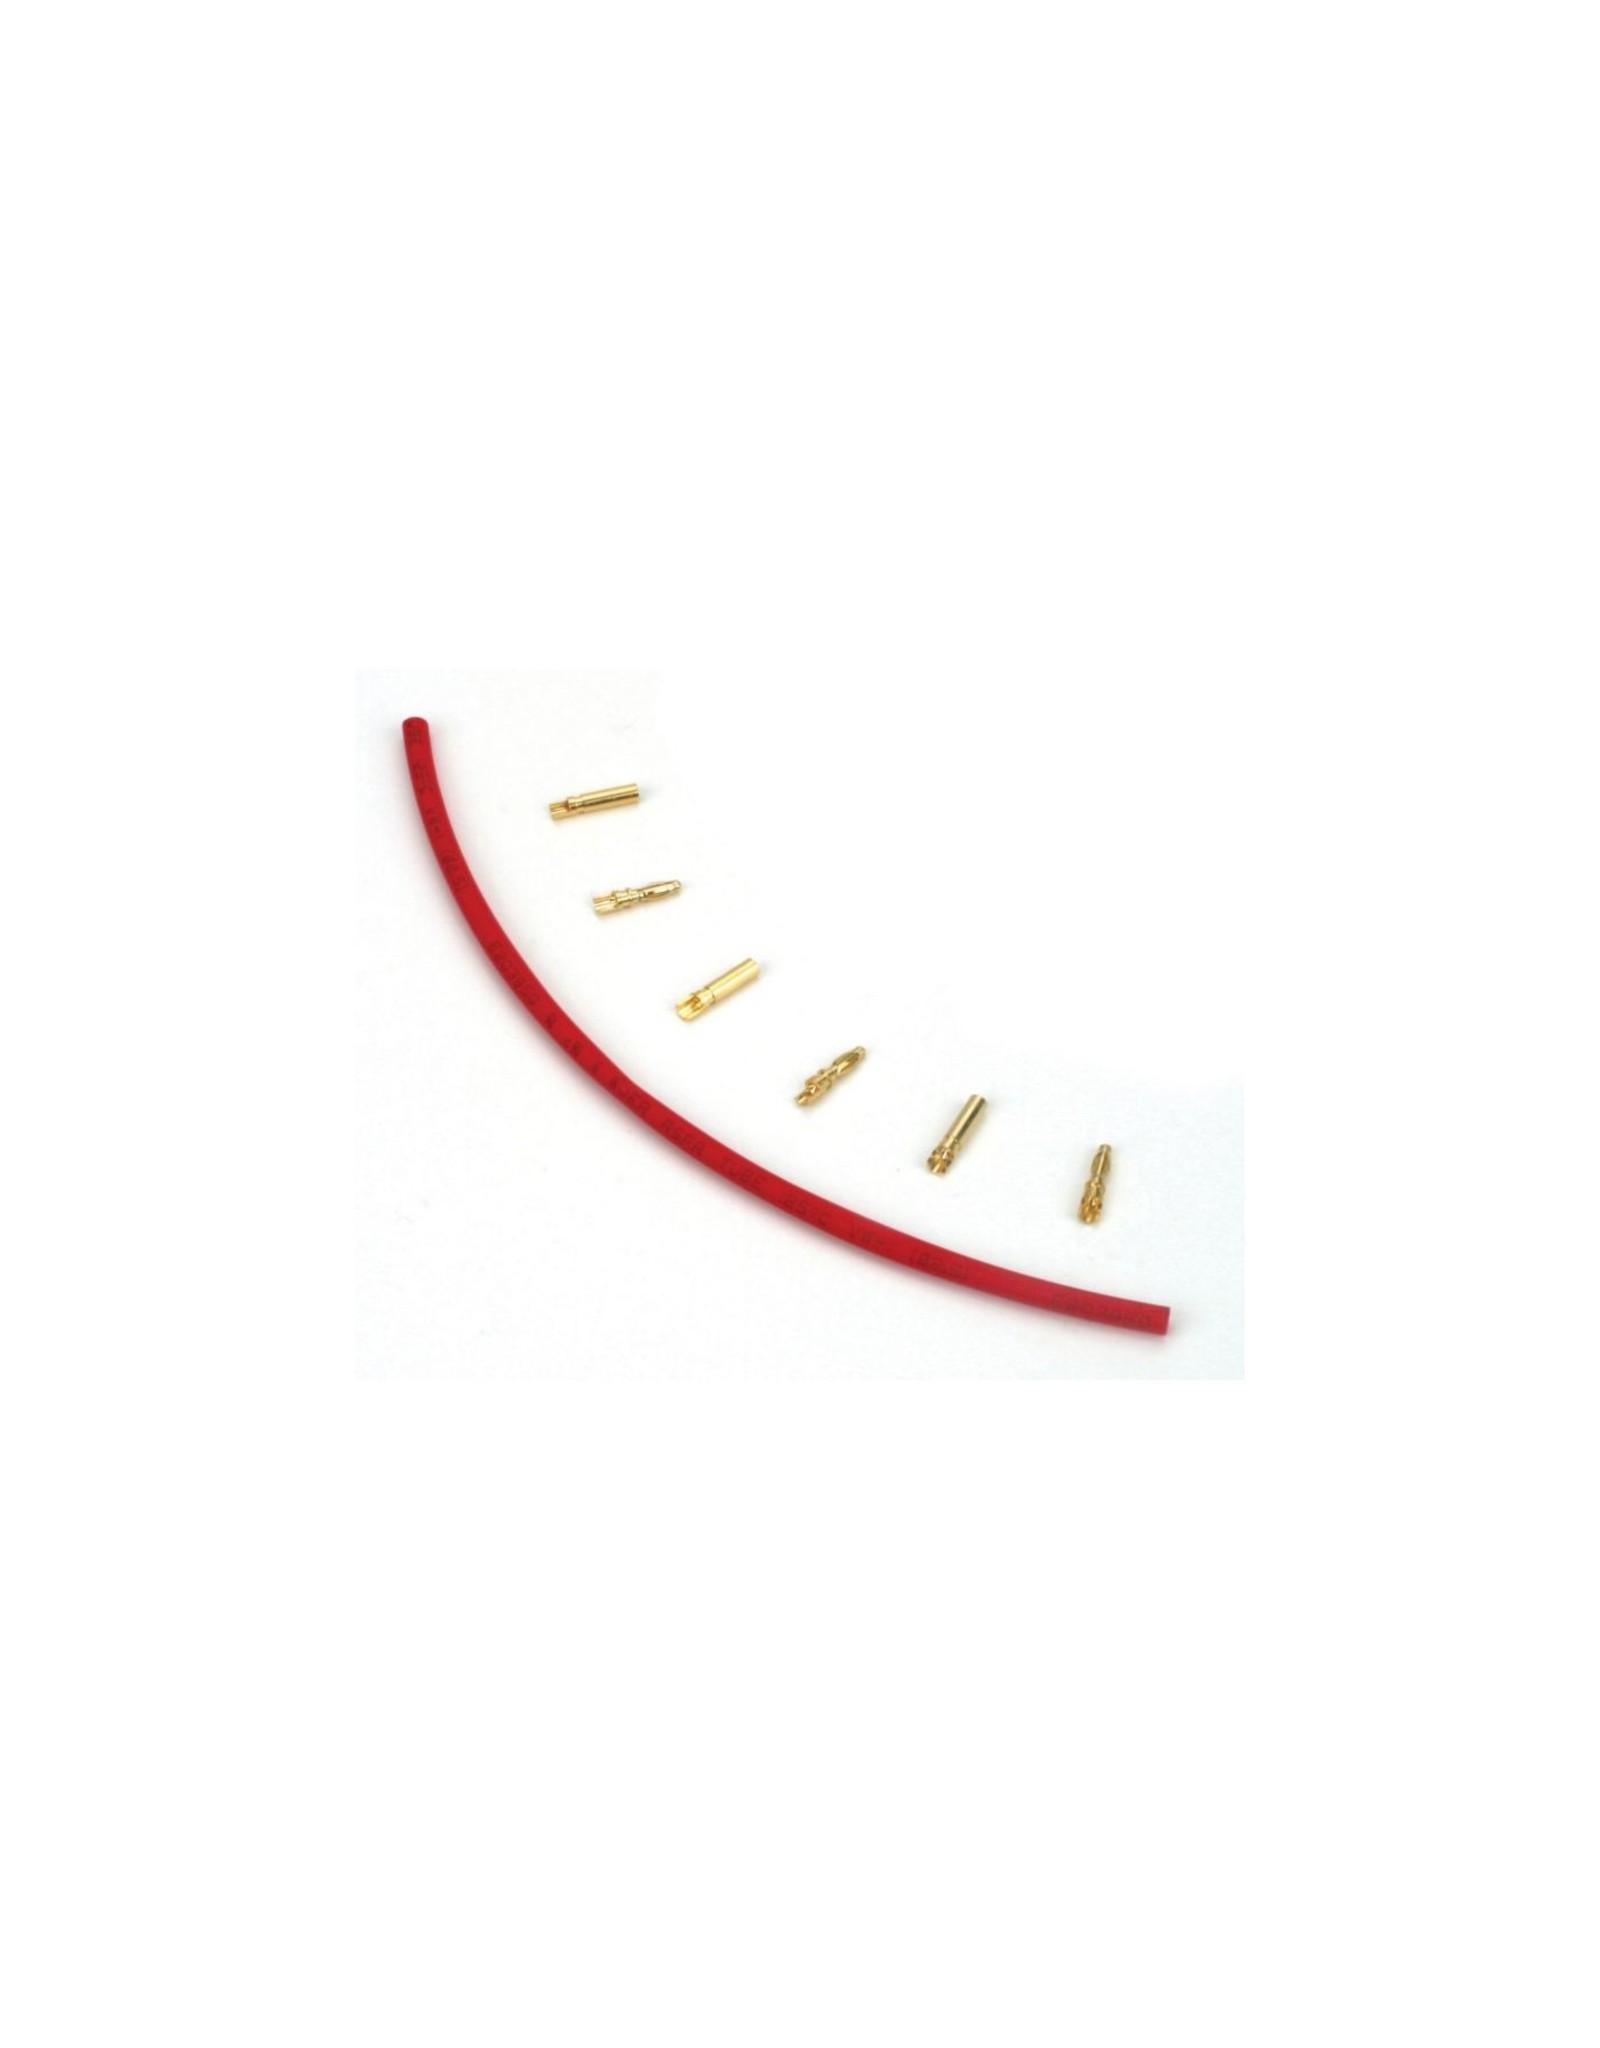 Dynamite Gold Bullet Connector Set, 2mm (3)  (DYNC0049)